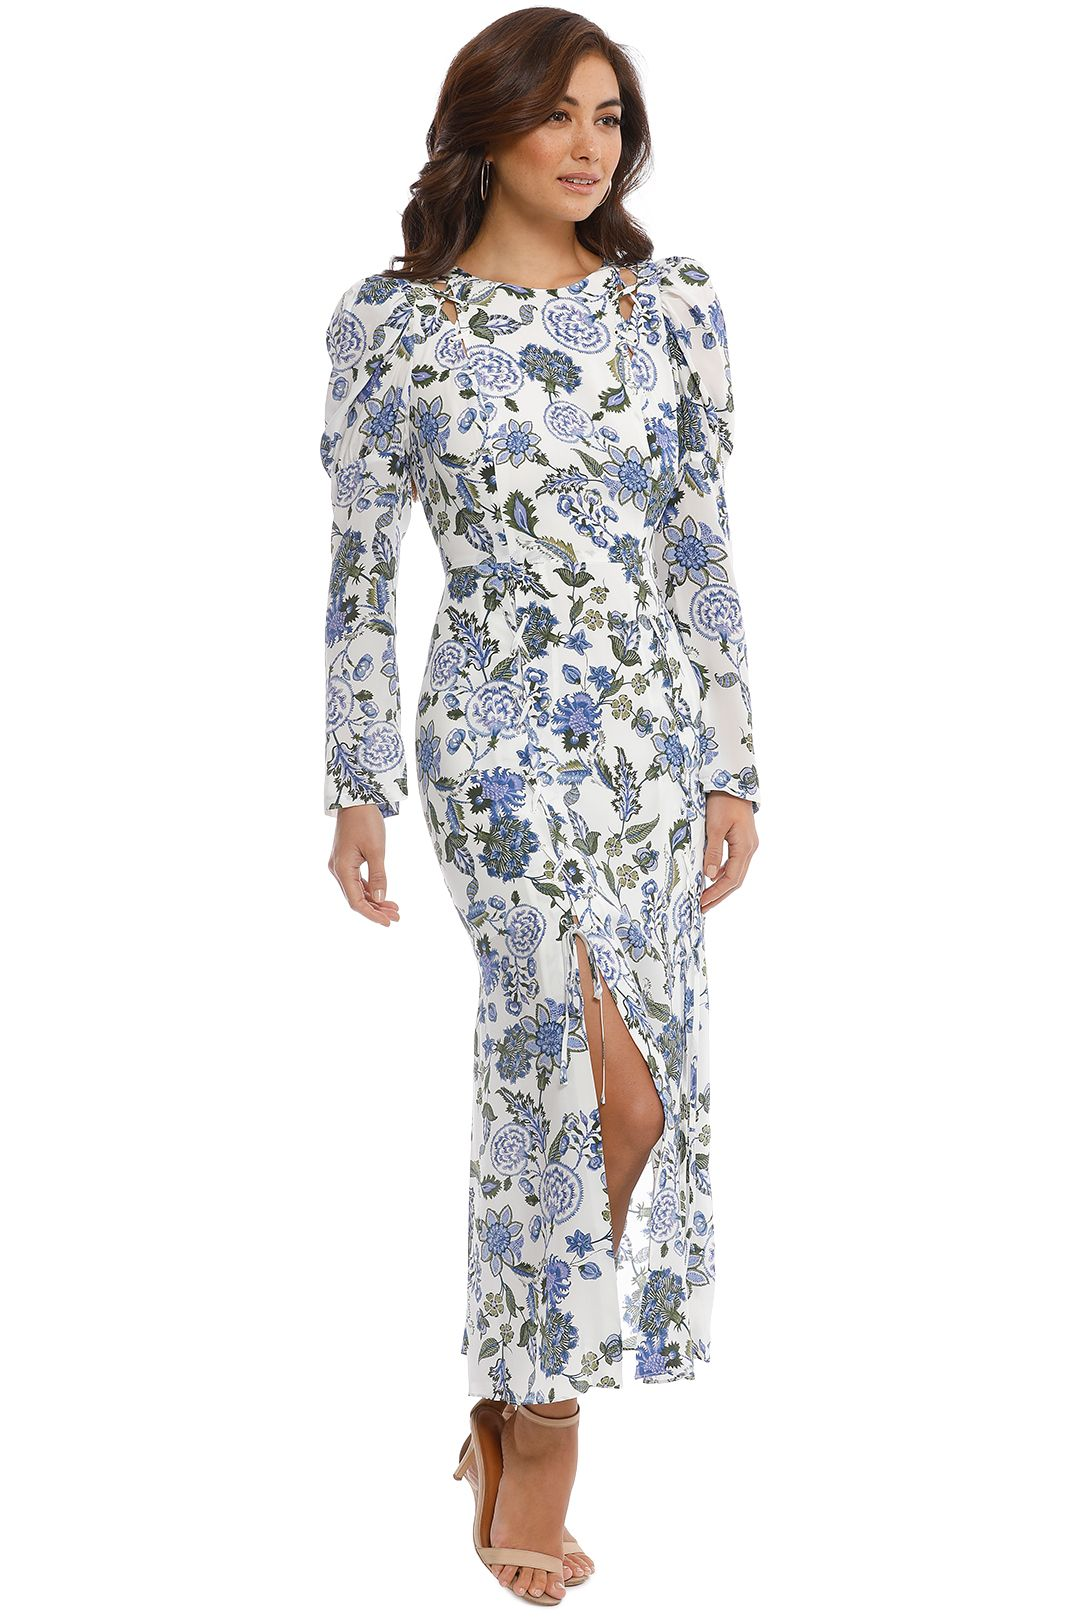 Thurley - Valentina Dress - Cornflower - Side